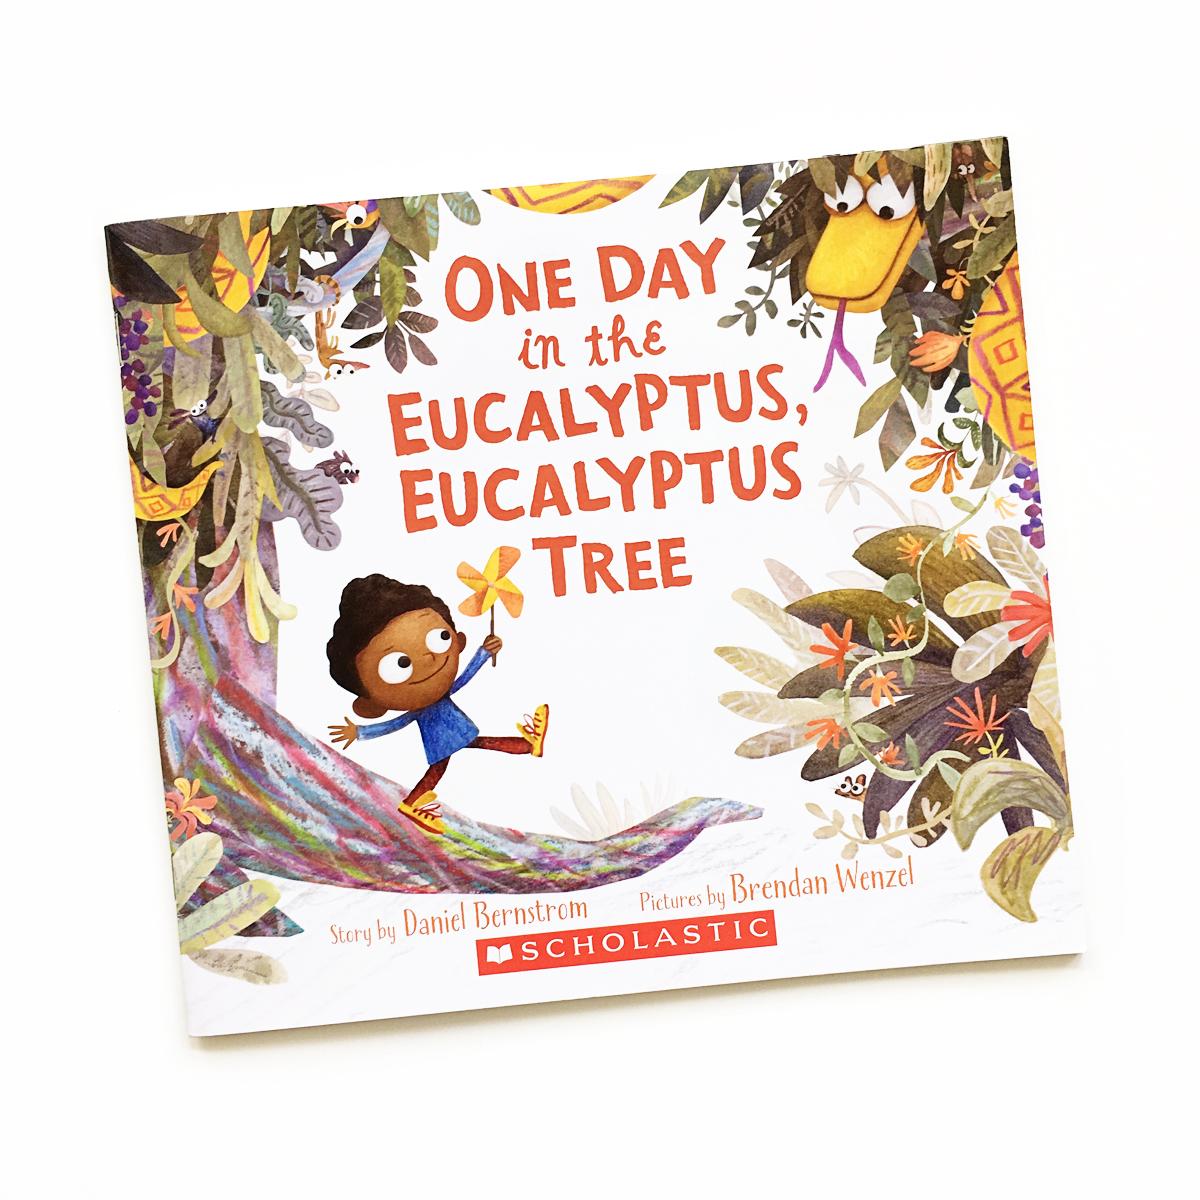 One Day in the Eucalyptus, Eucalyptus Tree | Books For Diversity